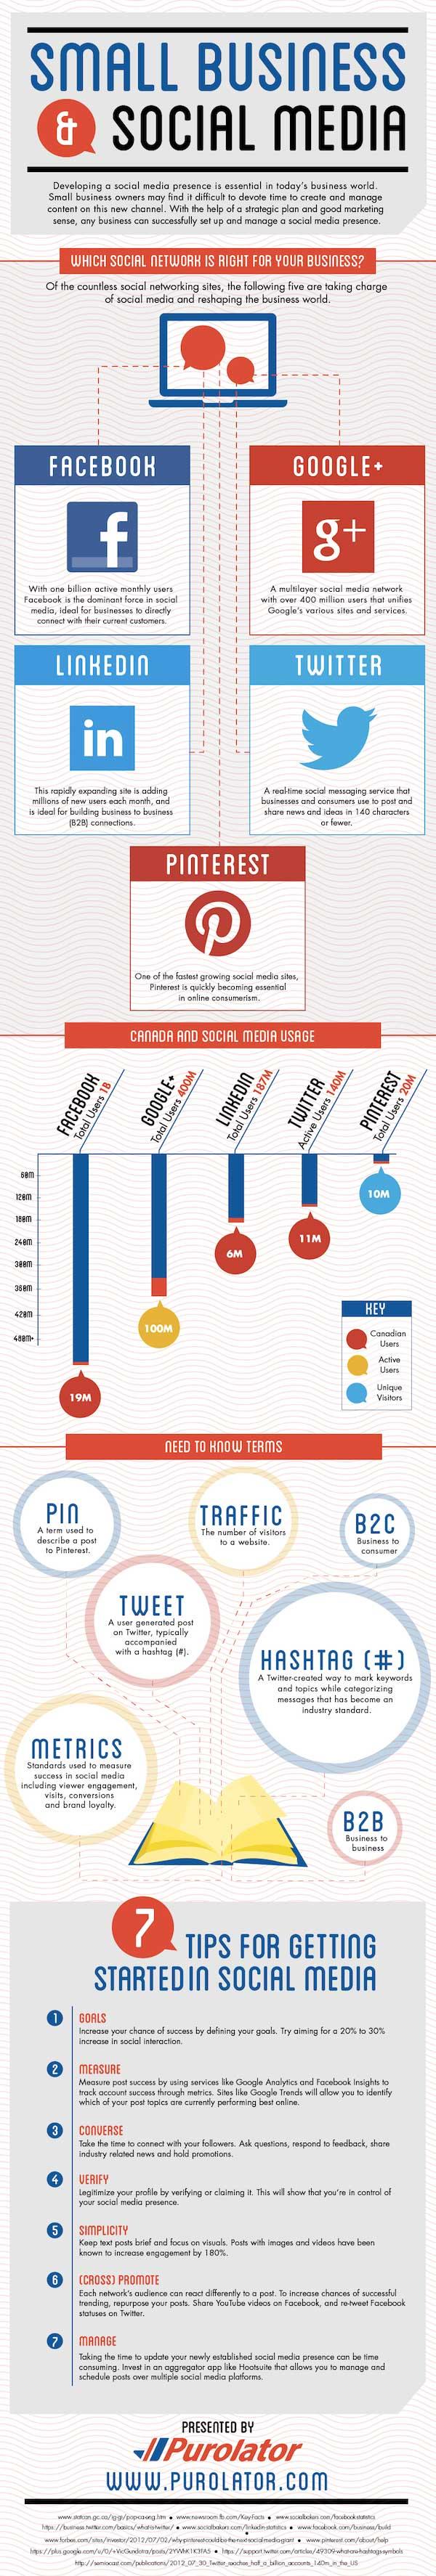 small-biz-social-media-infographic-bestbuzz